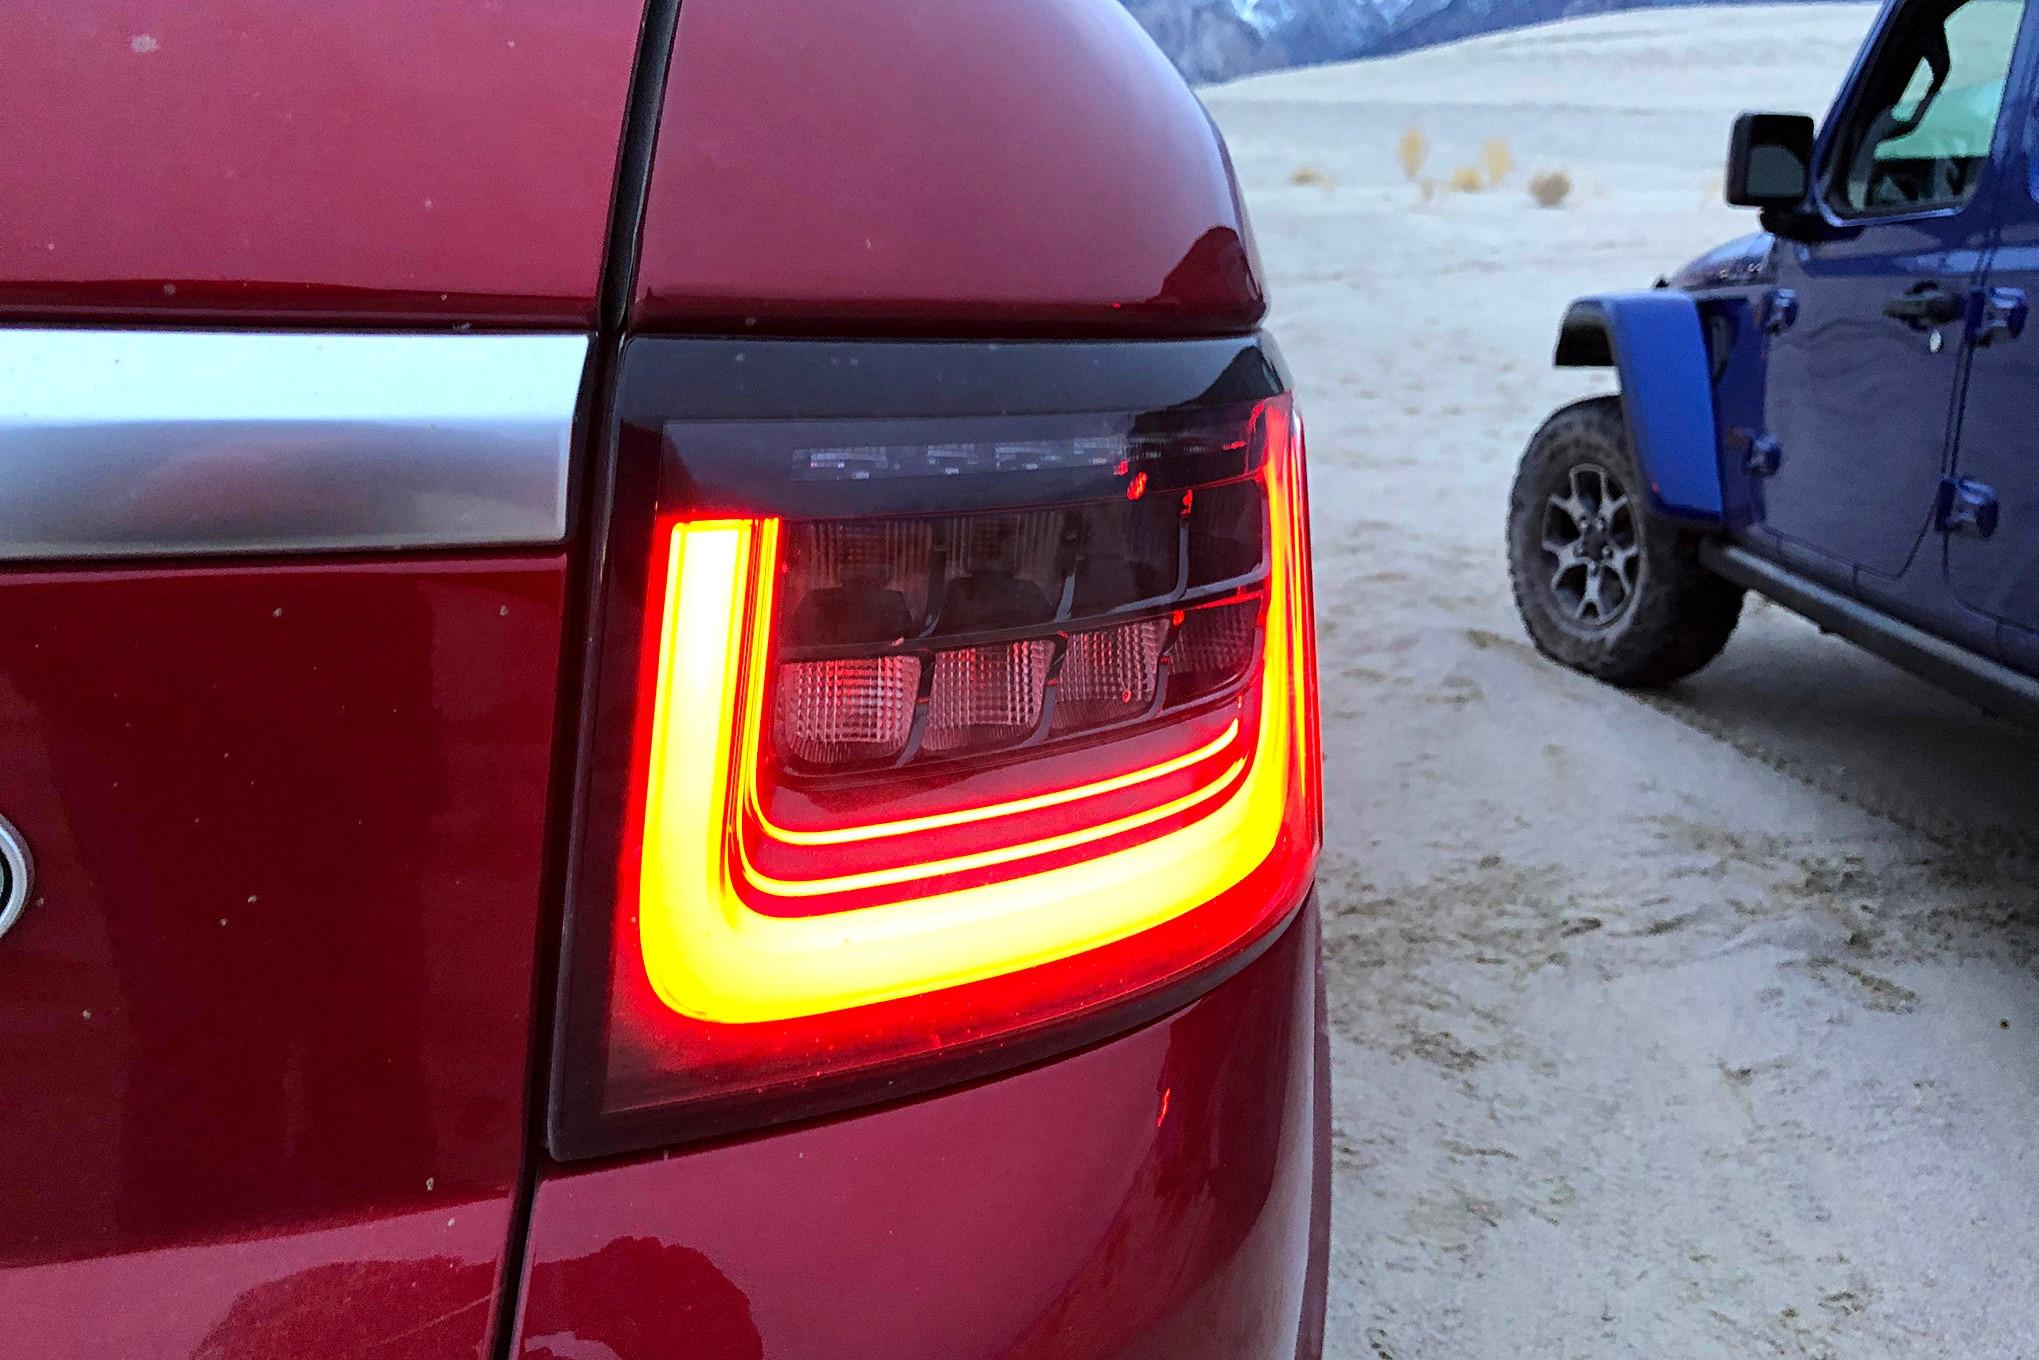 fwoty19 lighting range rover hsa taillight